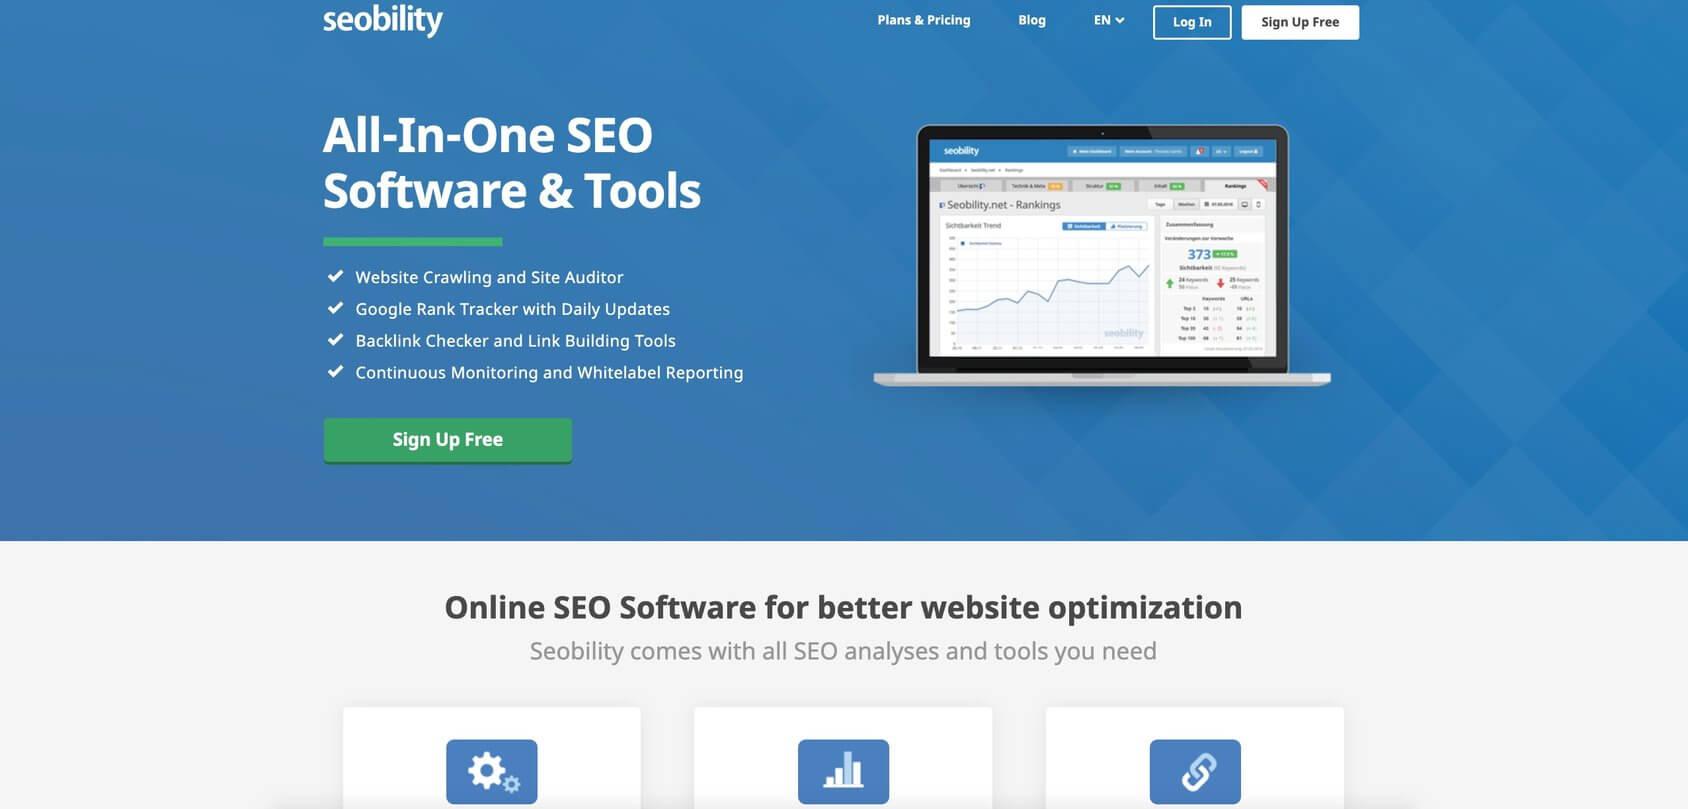 Seobility homepage